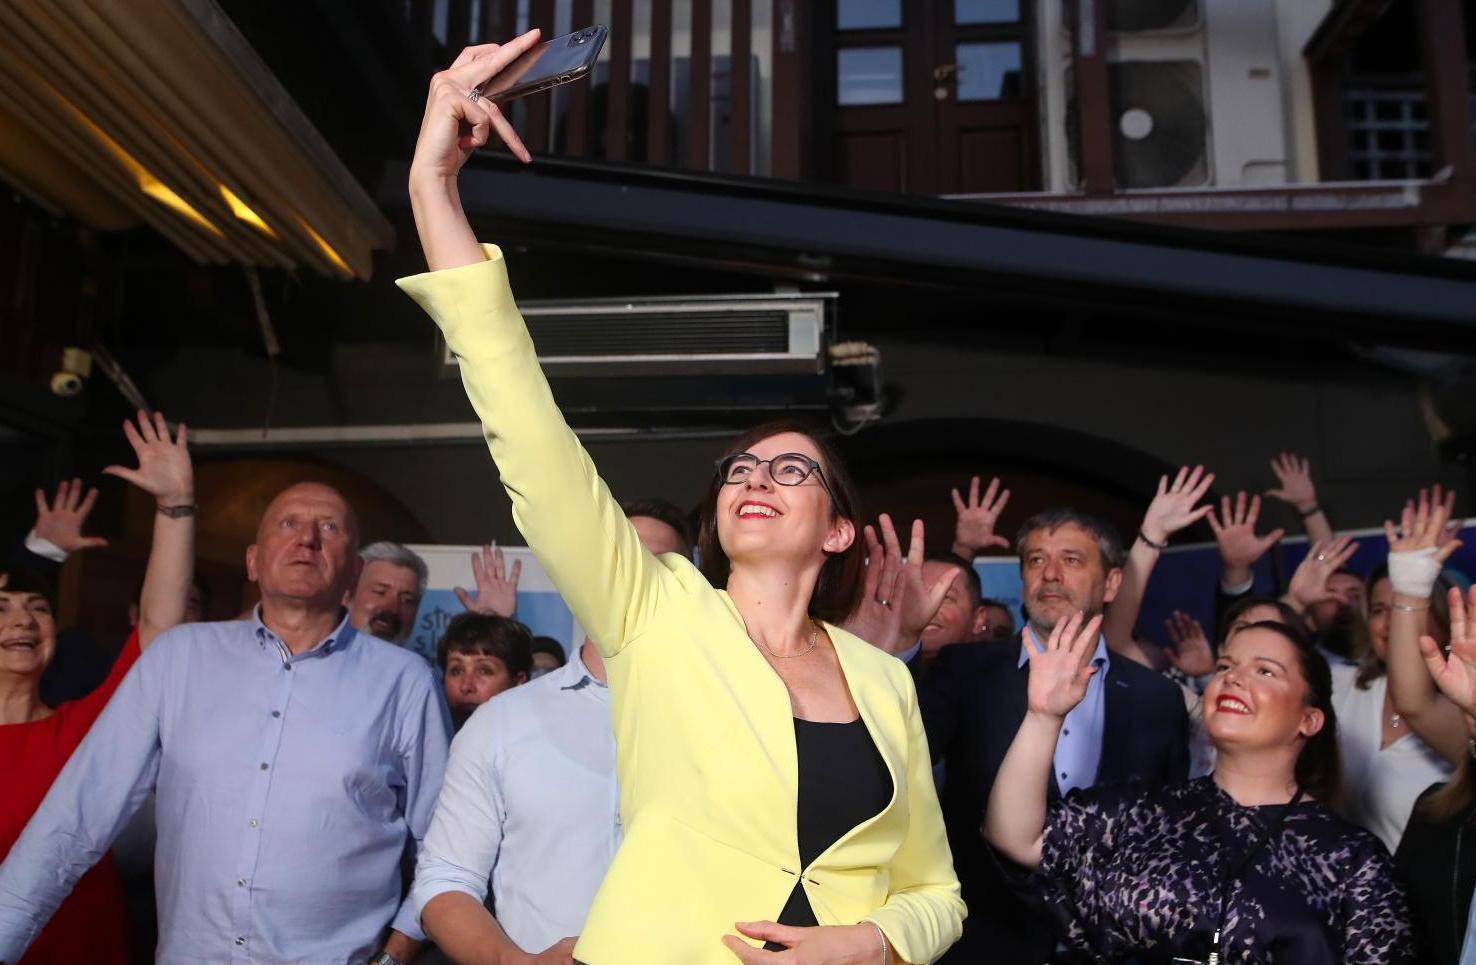 Prvi neslužbeni rezultati - Stanka s imenom i prezimenom, Fokus i Pametno ima 1 mandat